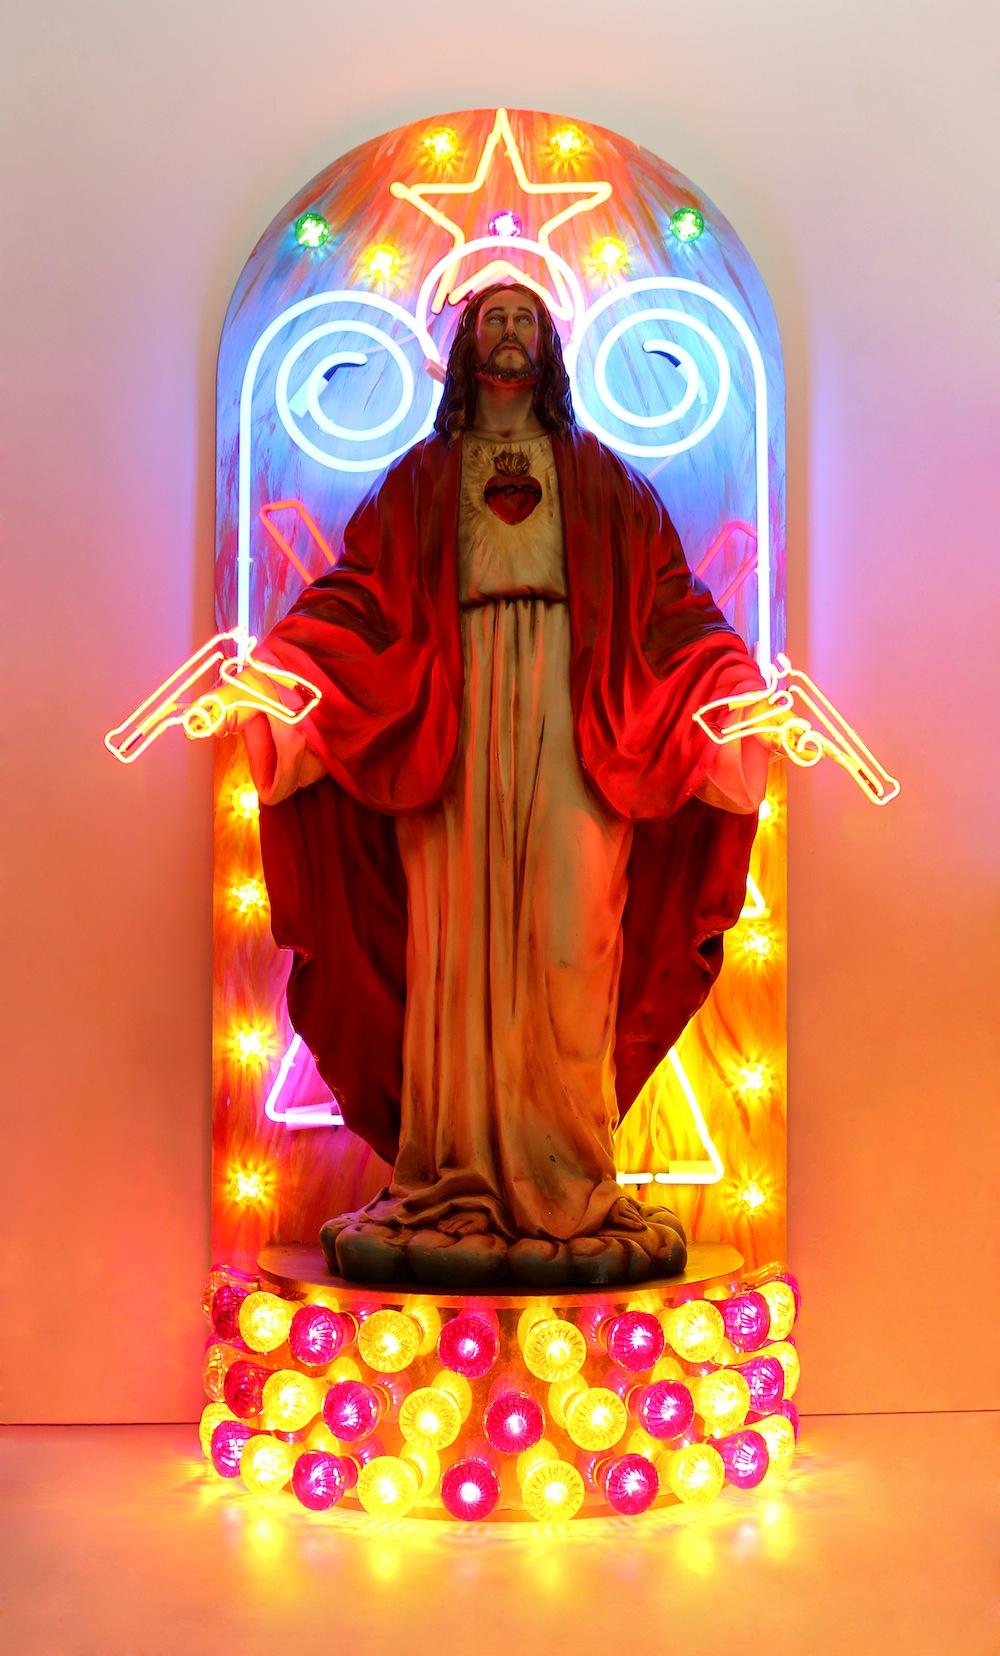 2014-02-12-jesus.jpg